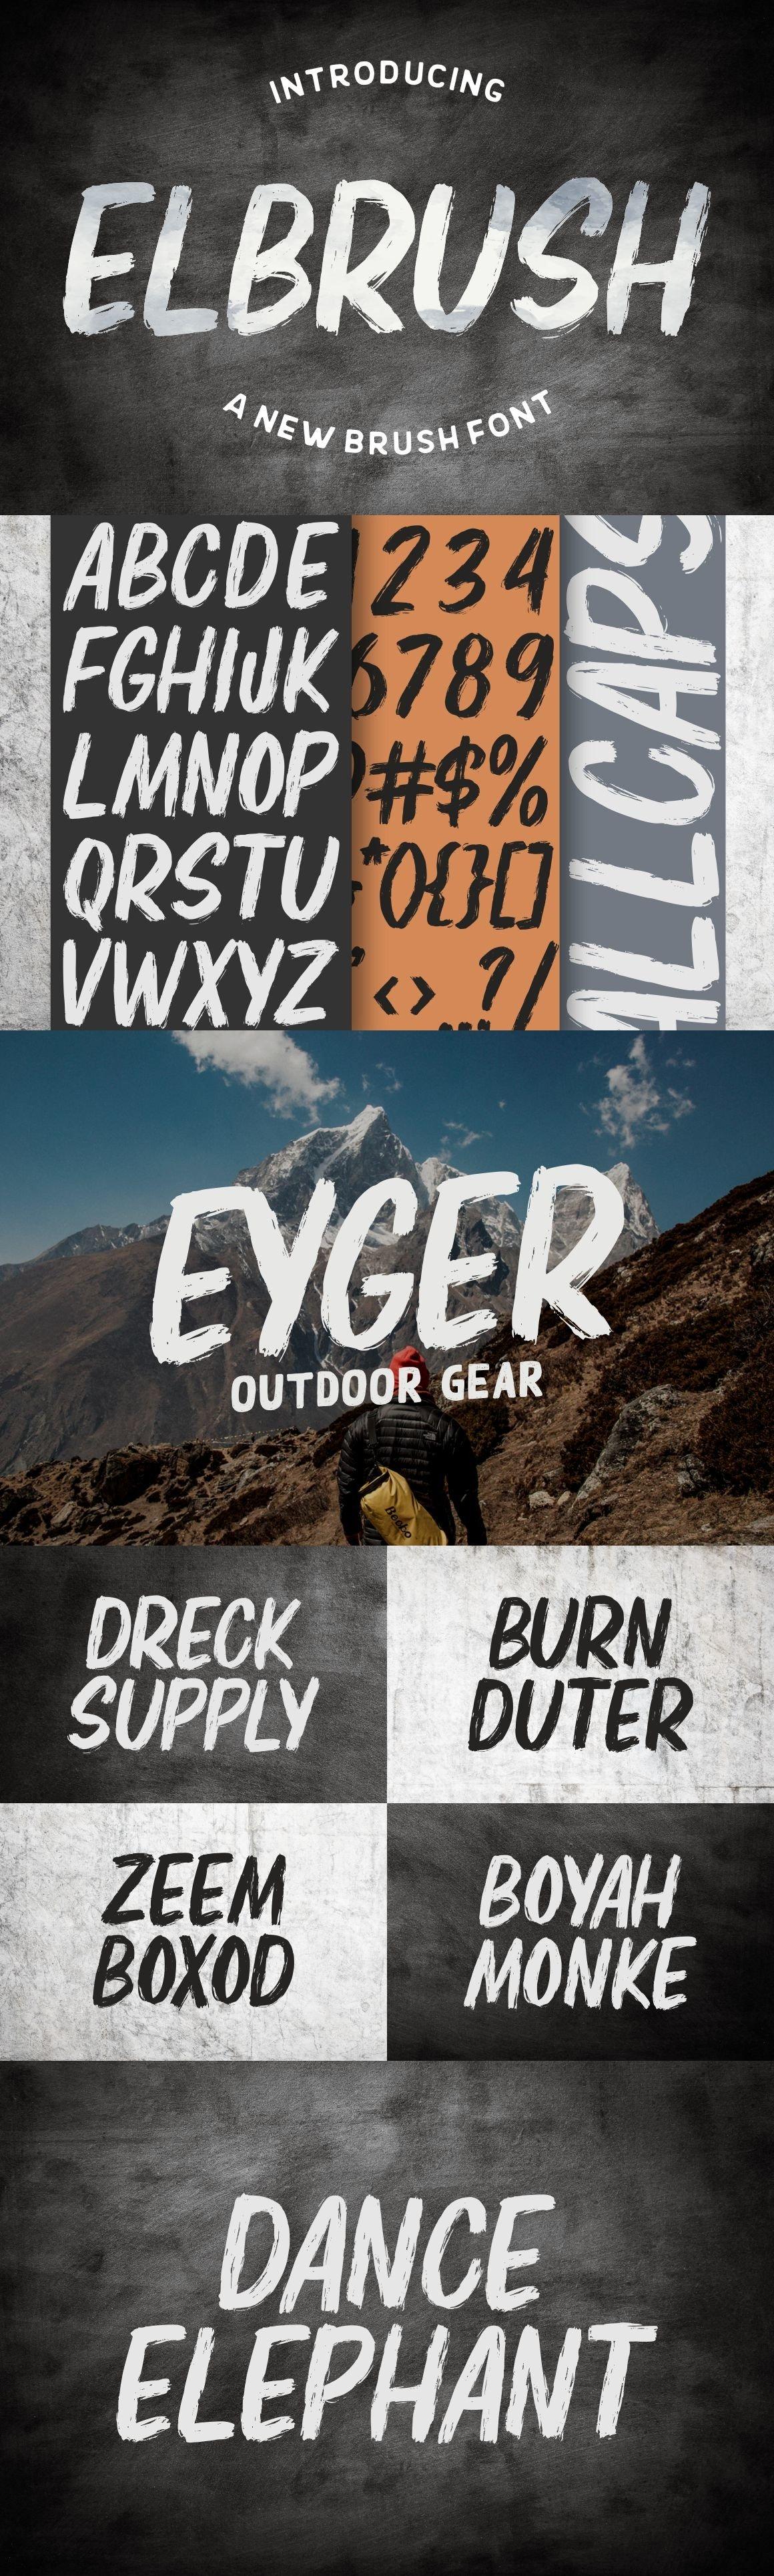 Elbrush - New Brush Font example image 2